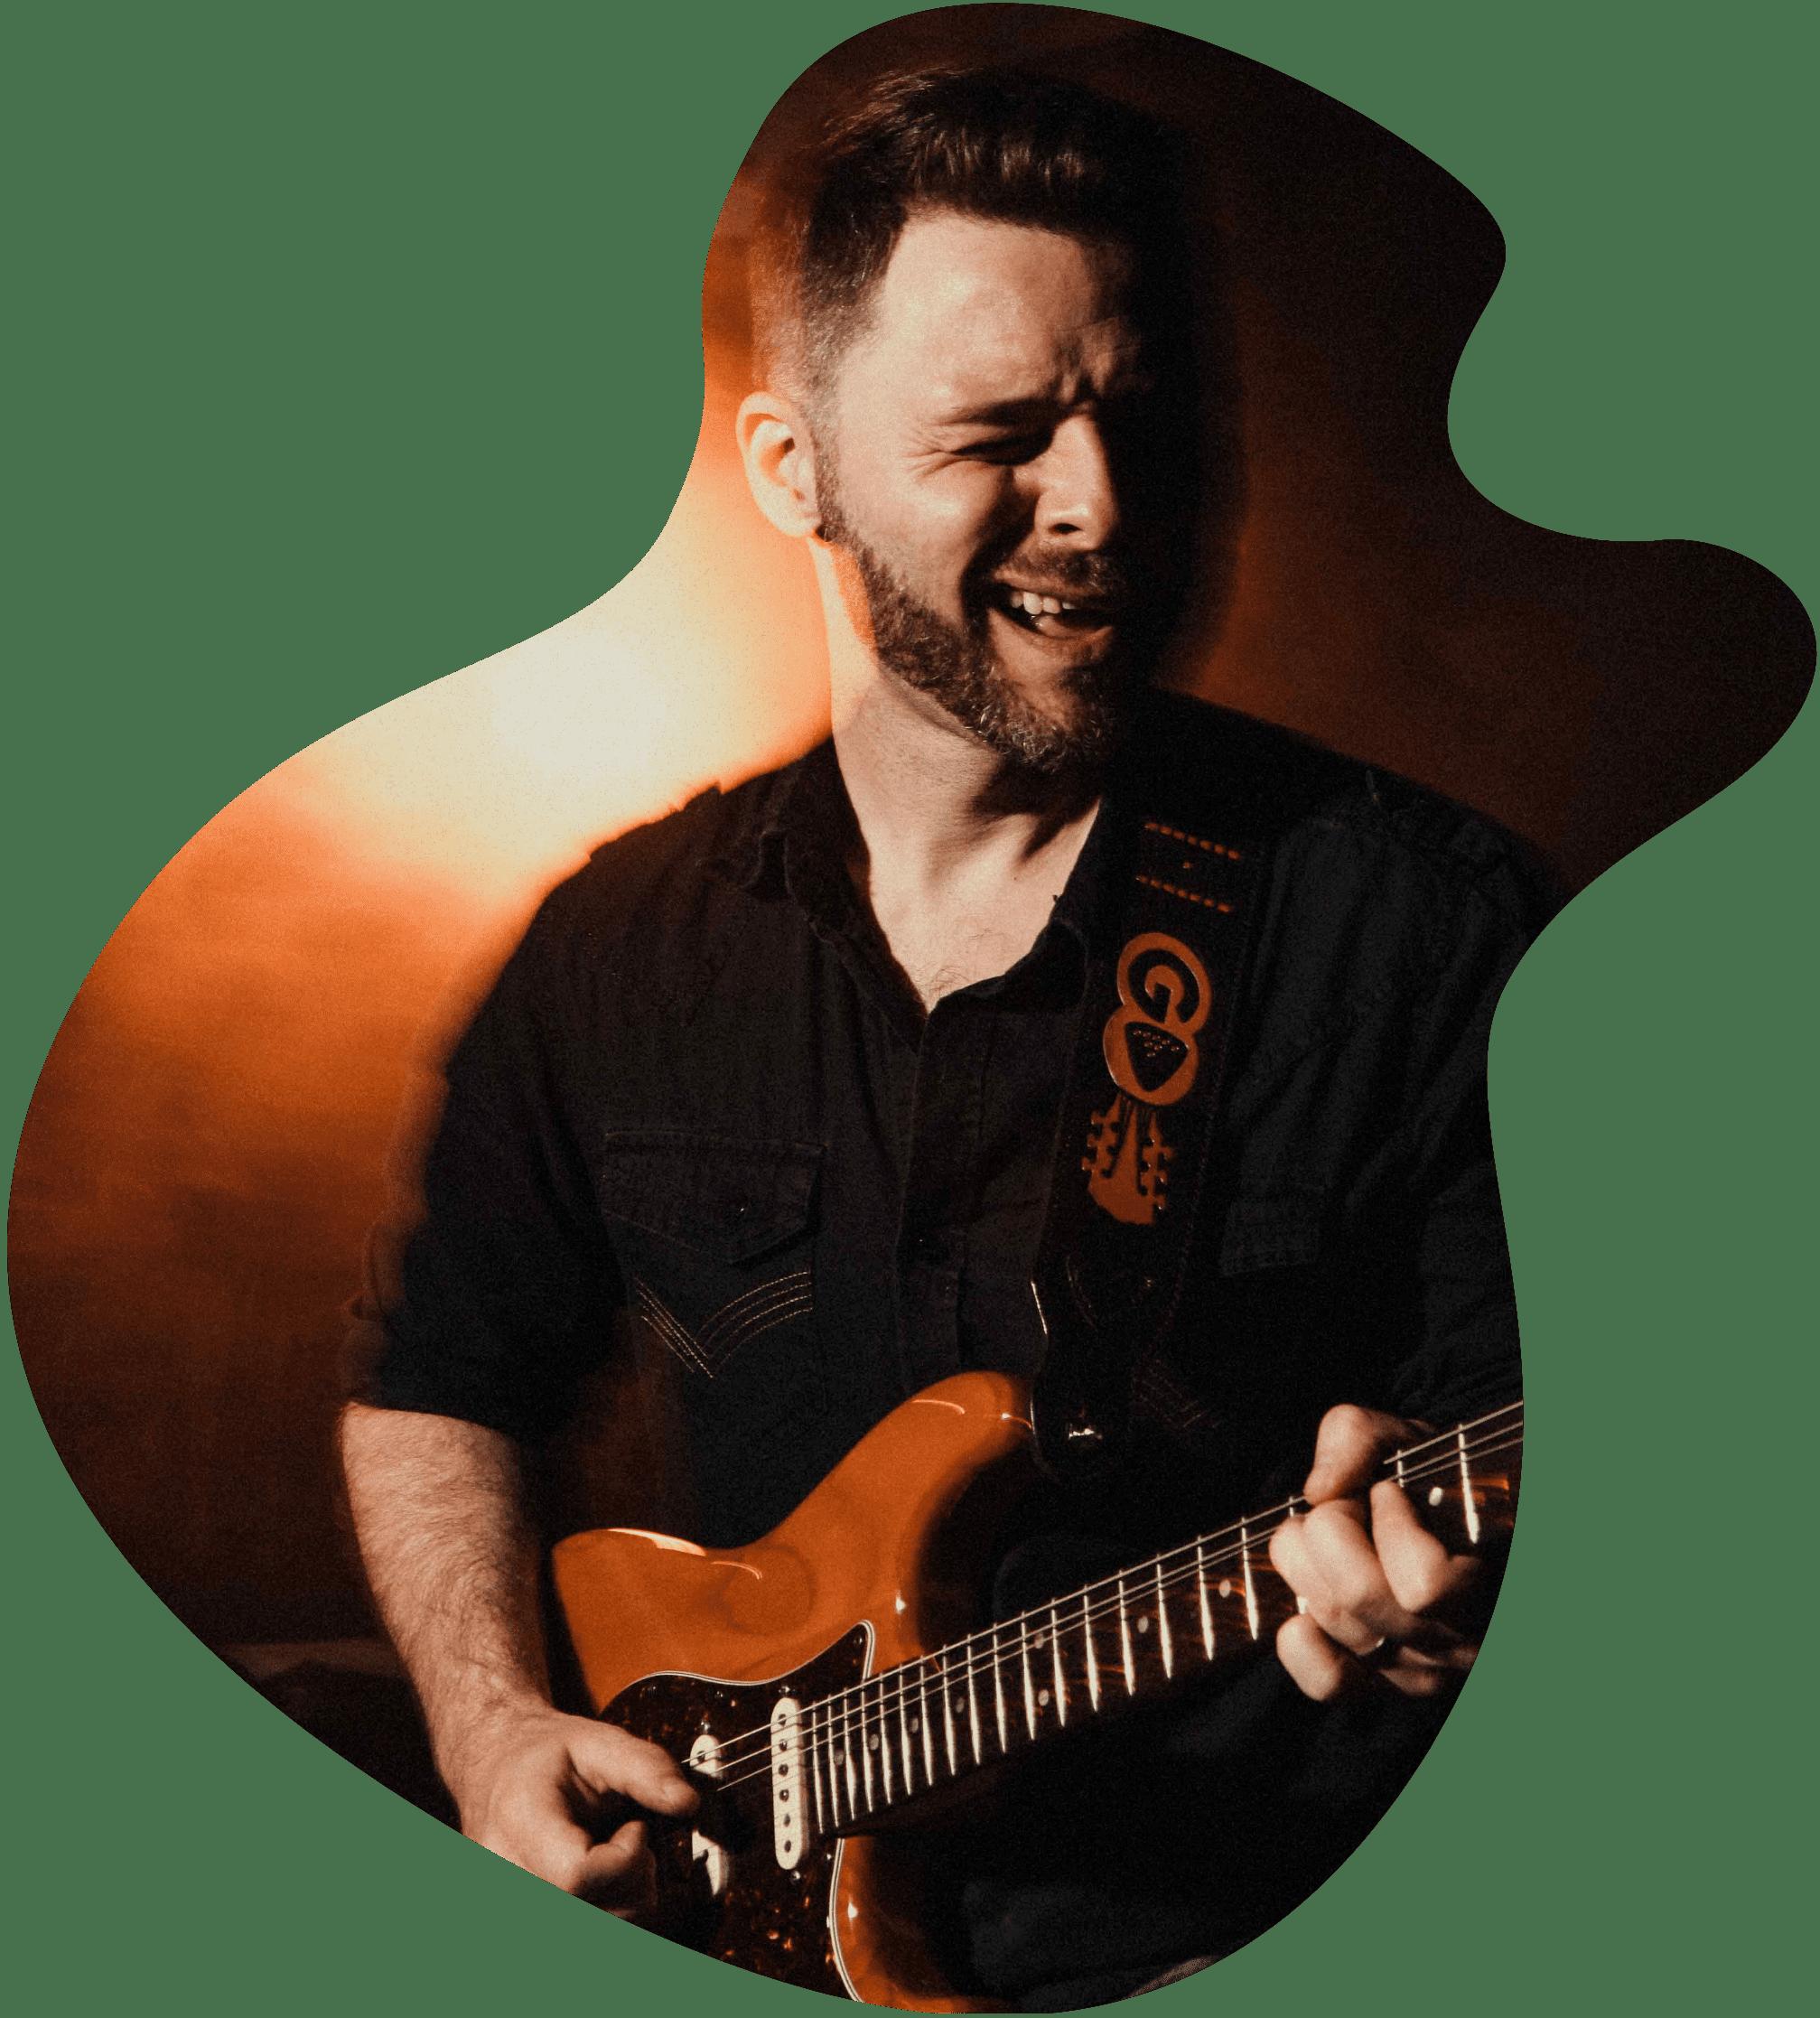 Francis O'Keefe jamming on his bass guitar